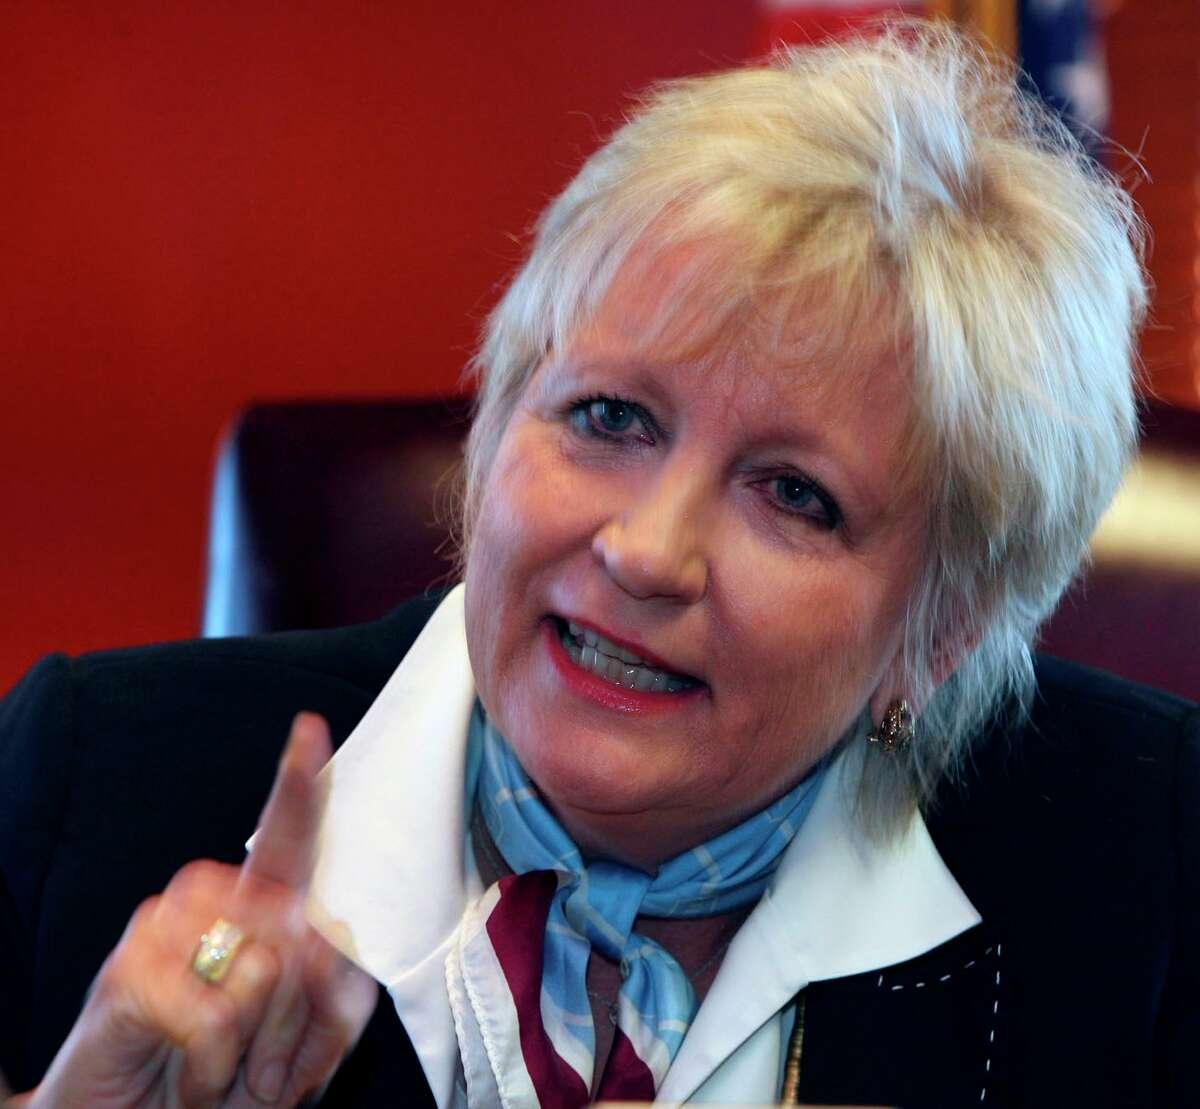 Bexar County District Attorney Susan Reed